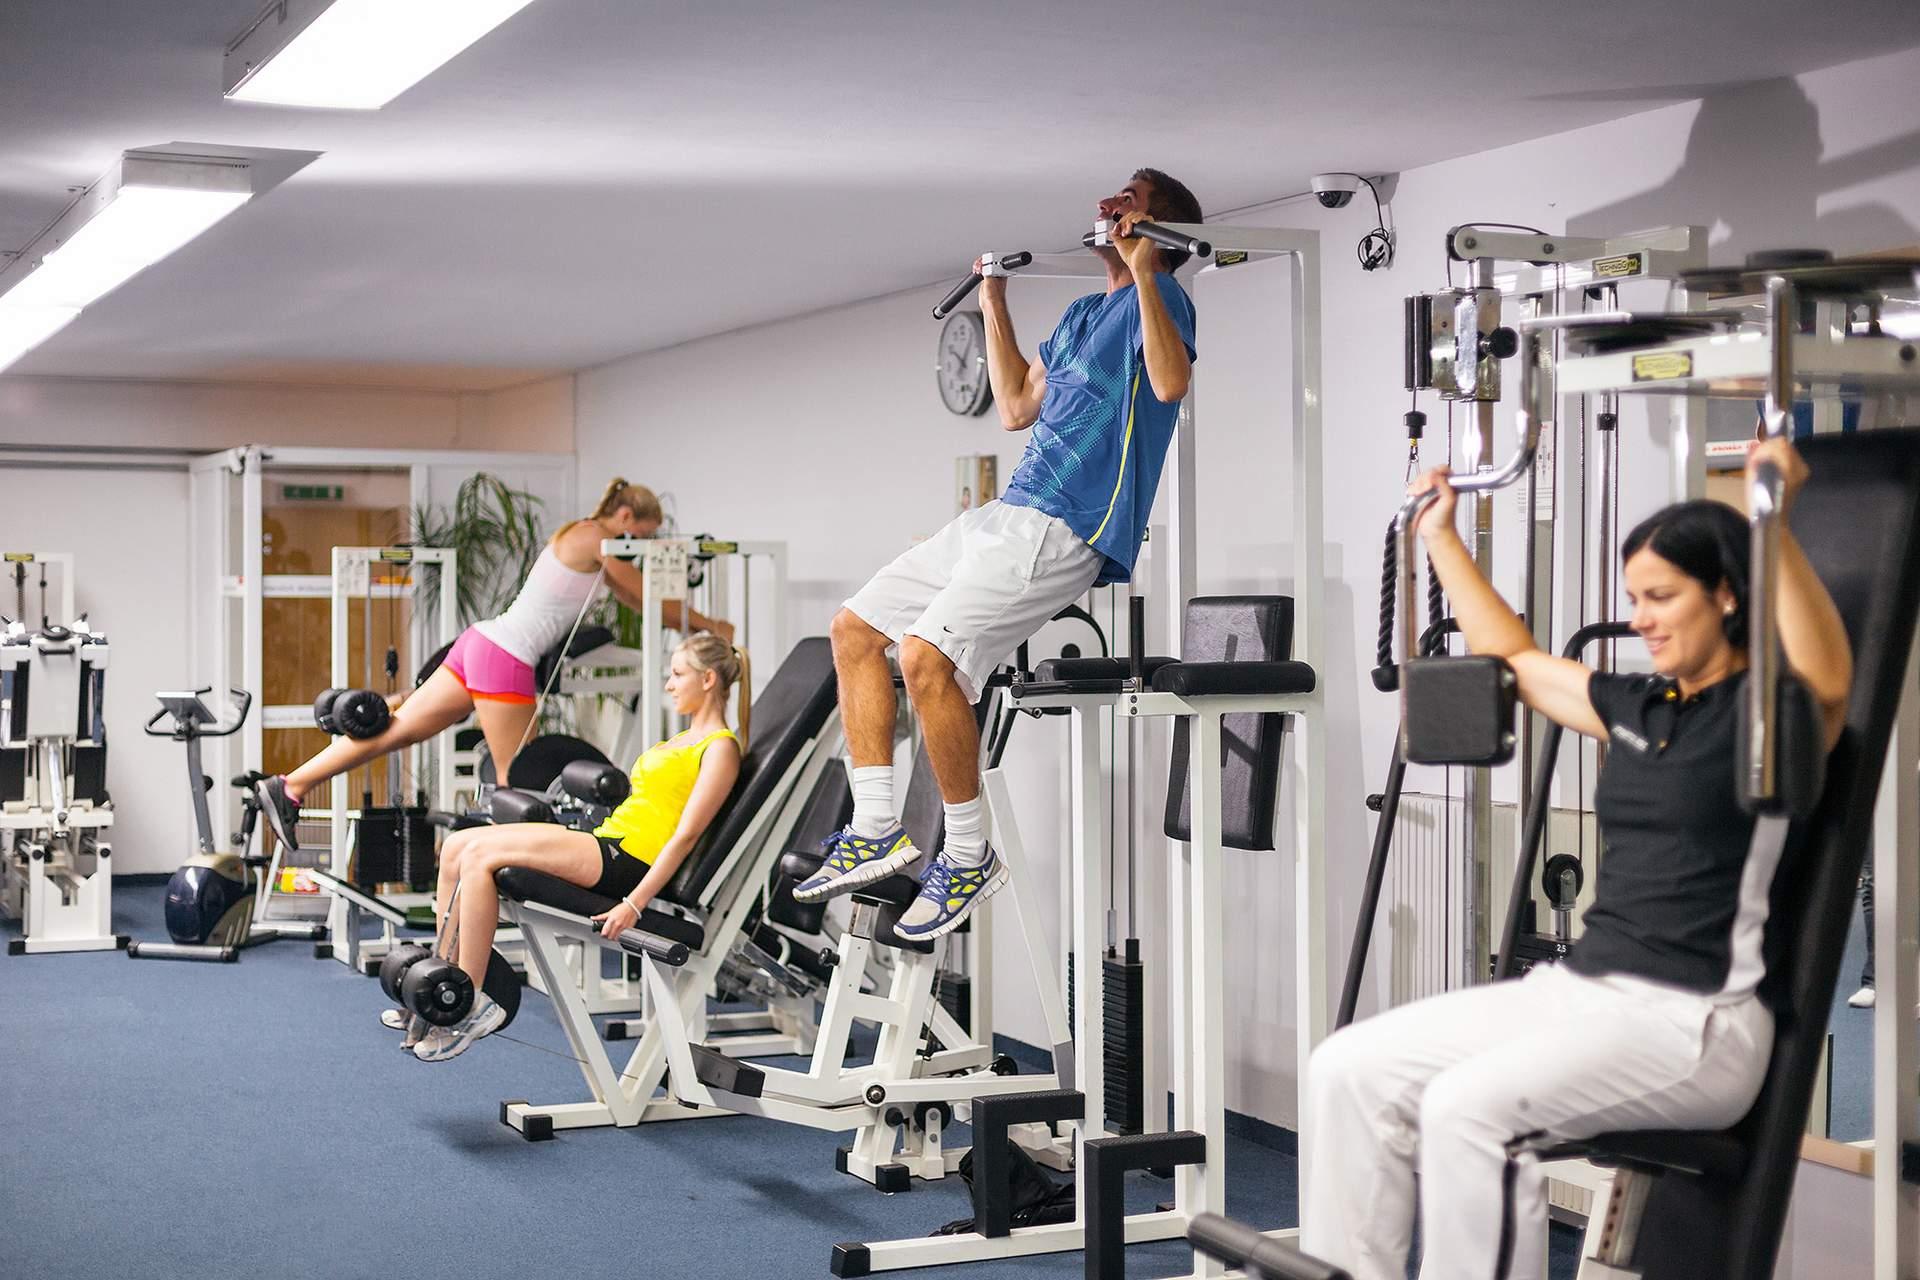 Komplett ausgestattetes Fitnesscenter